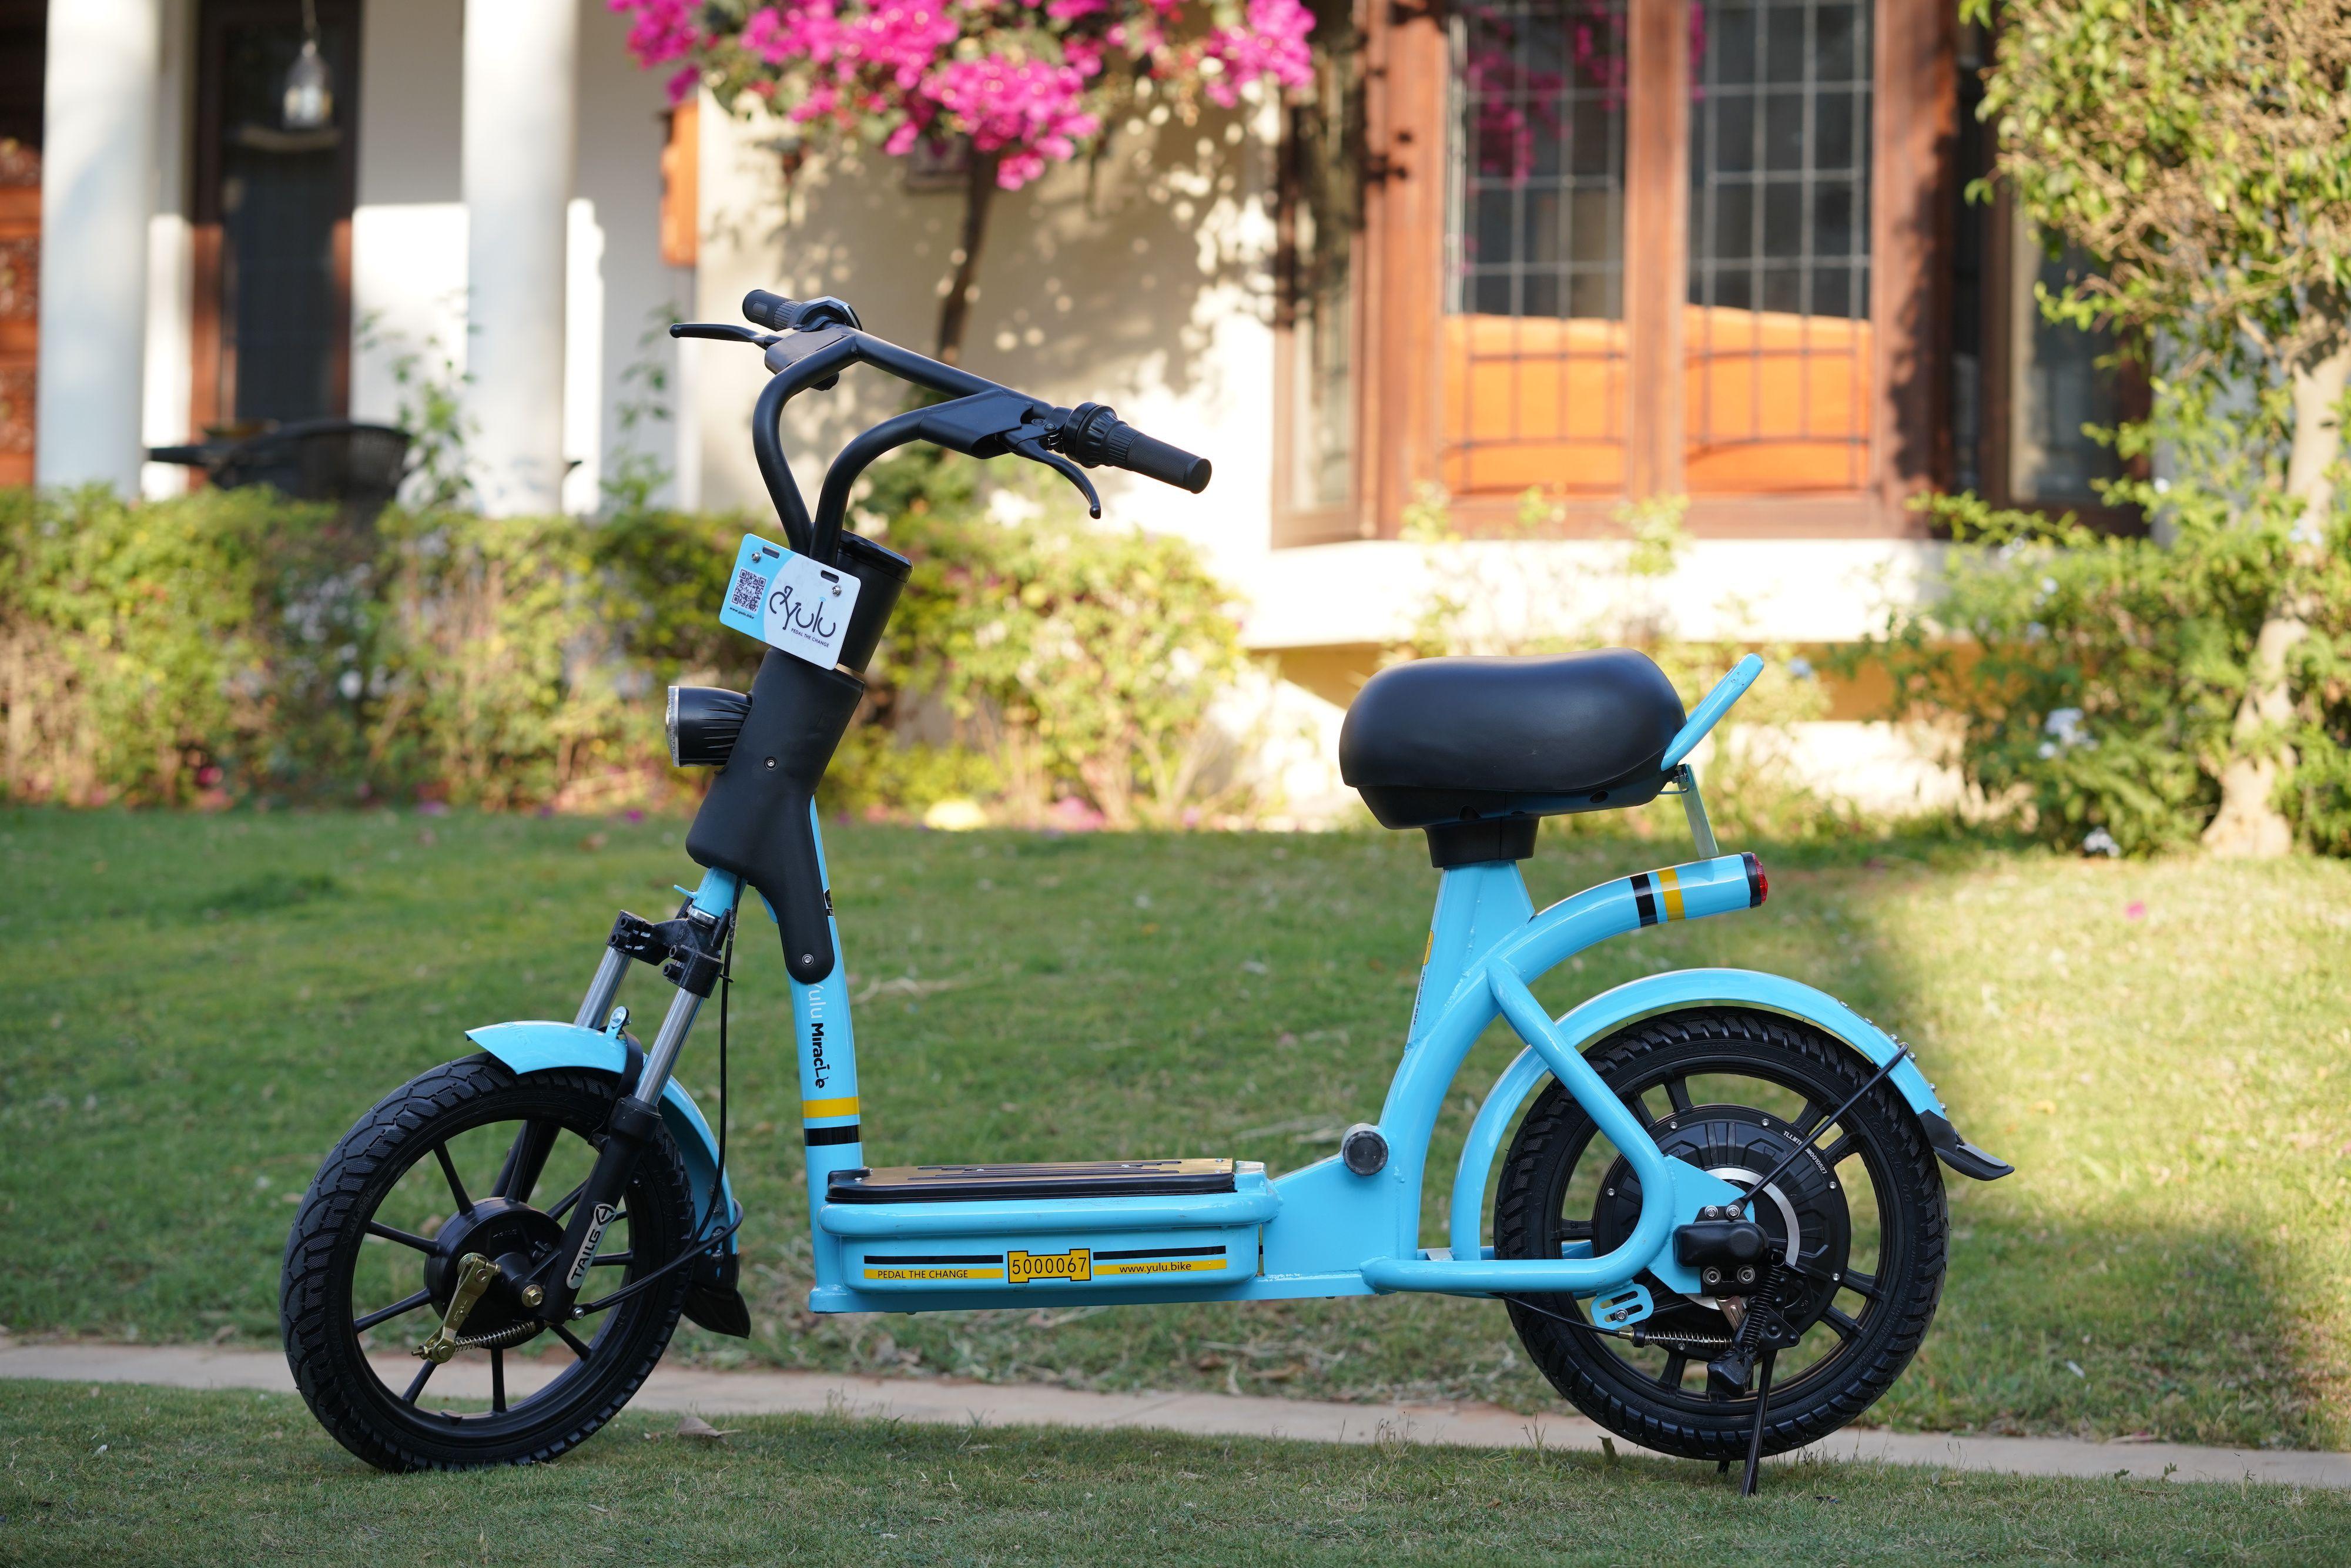 Electric Scooter Made In Europe In 2020 Bajaj Auto Electric Bike Bike Rental